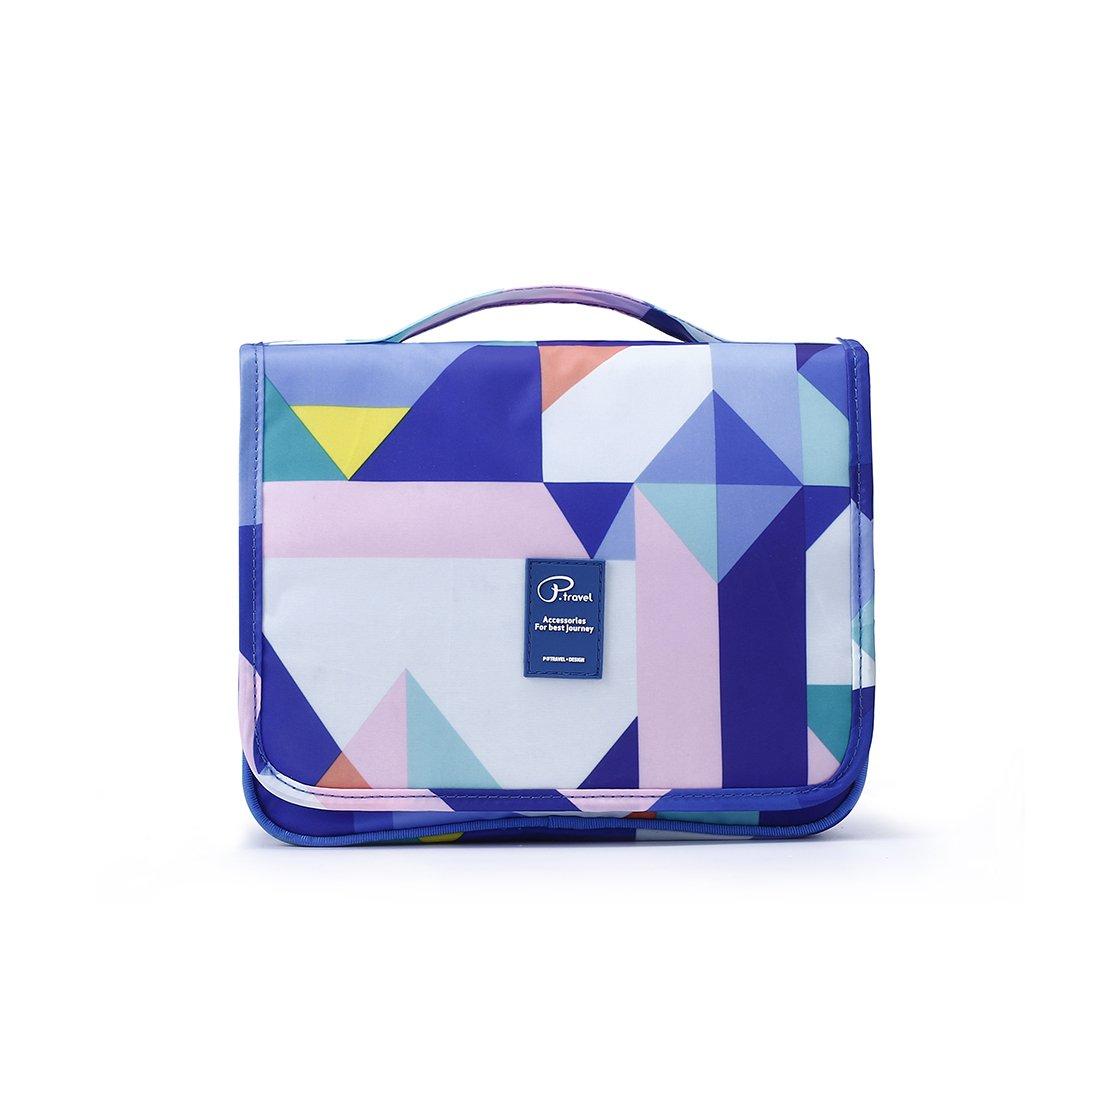 Best Travel Toiletry Bag TSA Friendly Makeup Organizer Big Bag for Womens Teen Girls Boys Kids, SUSU Blue Hanging Dopp Kit Organizer Set Compact Gym Bag Organizer Case Camping Toiletry Bag